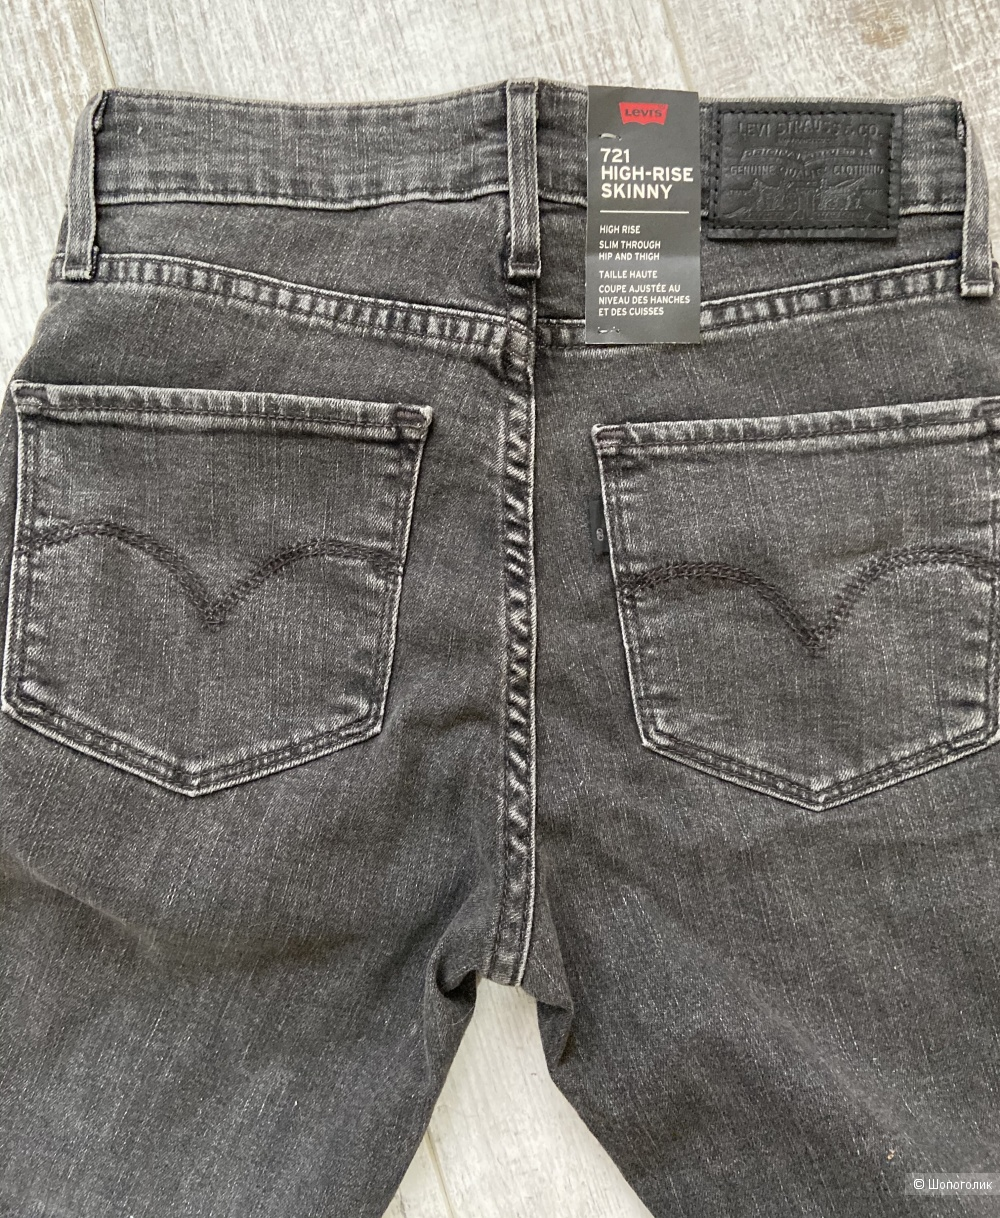 Темно-серые джинсы Levi's 721 High-rise Skinny/ W25-L32